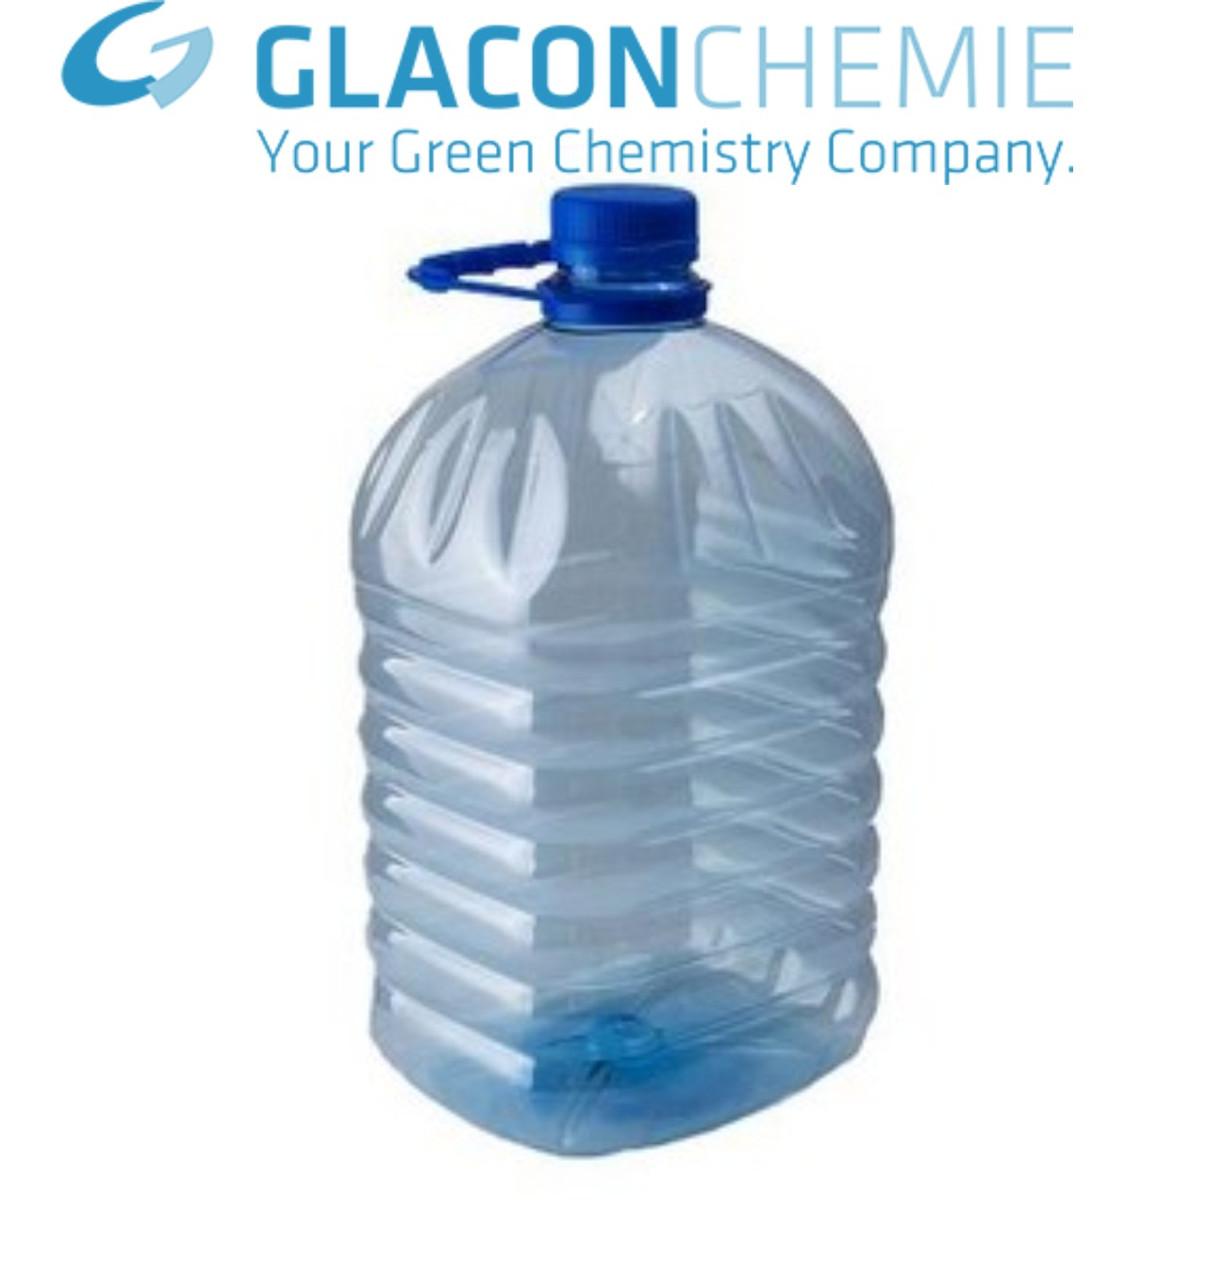 Глицерин Glaconchemie оптом глицерин VG, Германия, (6 кг)